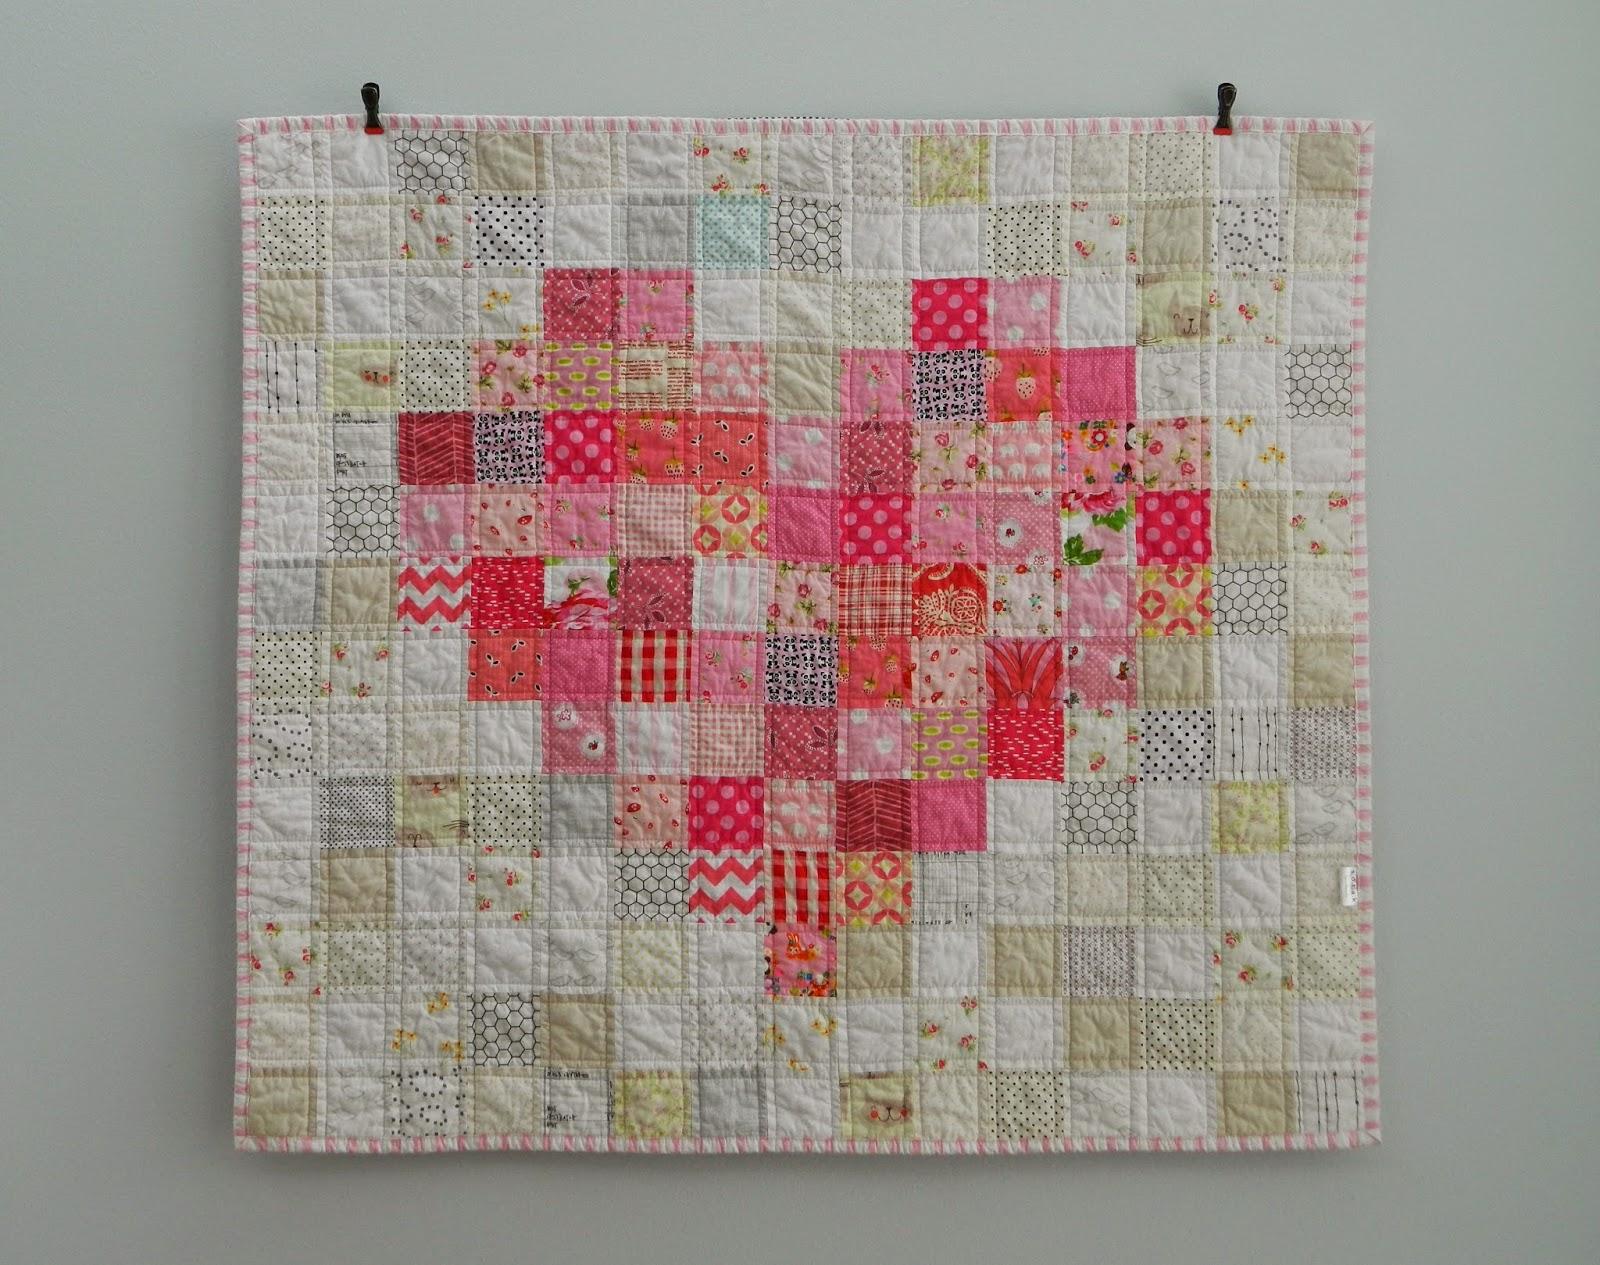 http://sotakhandmade.blogspot.com/2014/05/pink-love-finished-baby-quilt.html